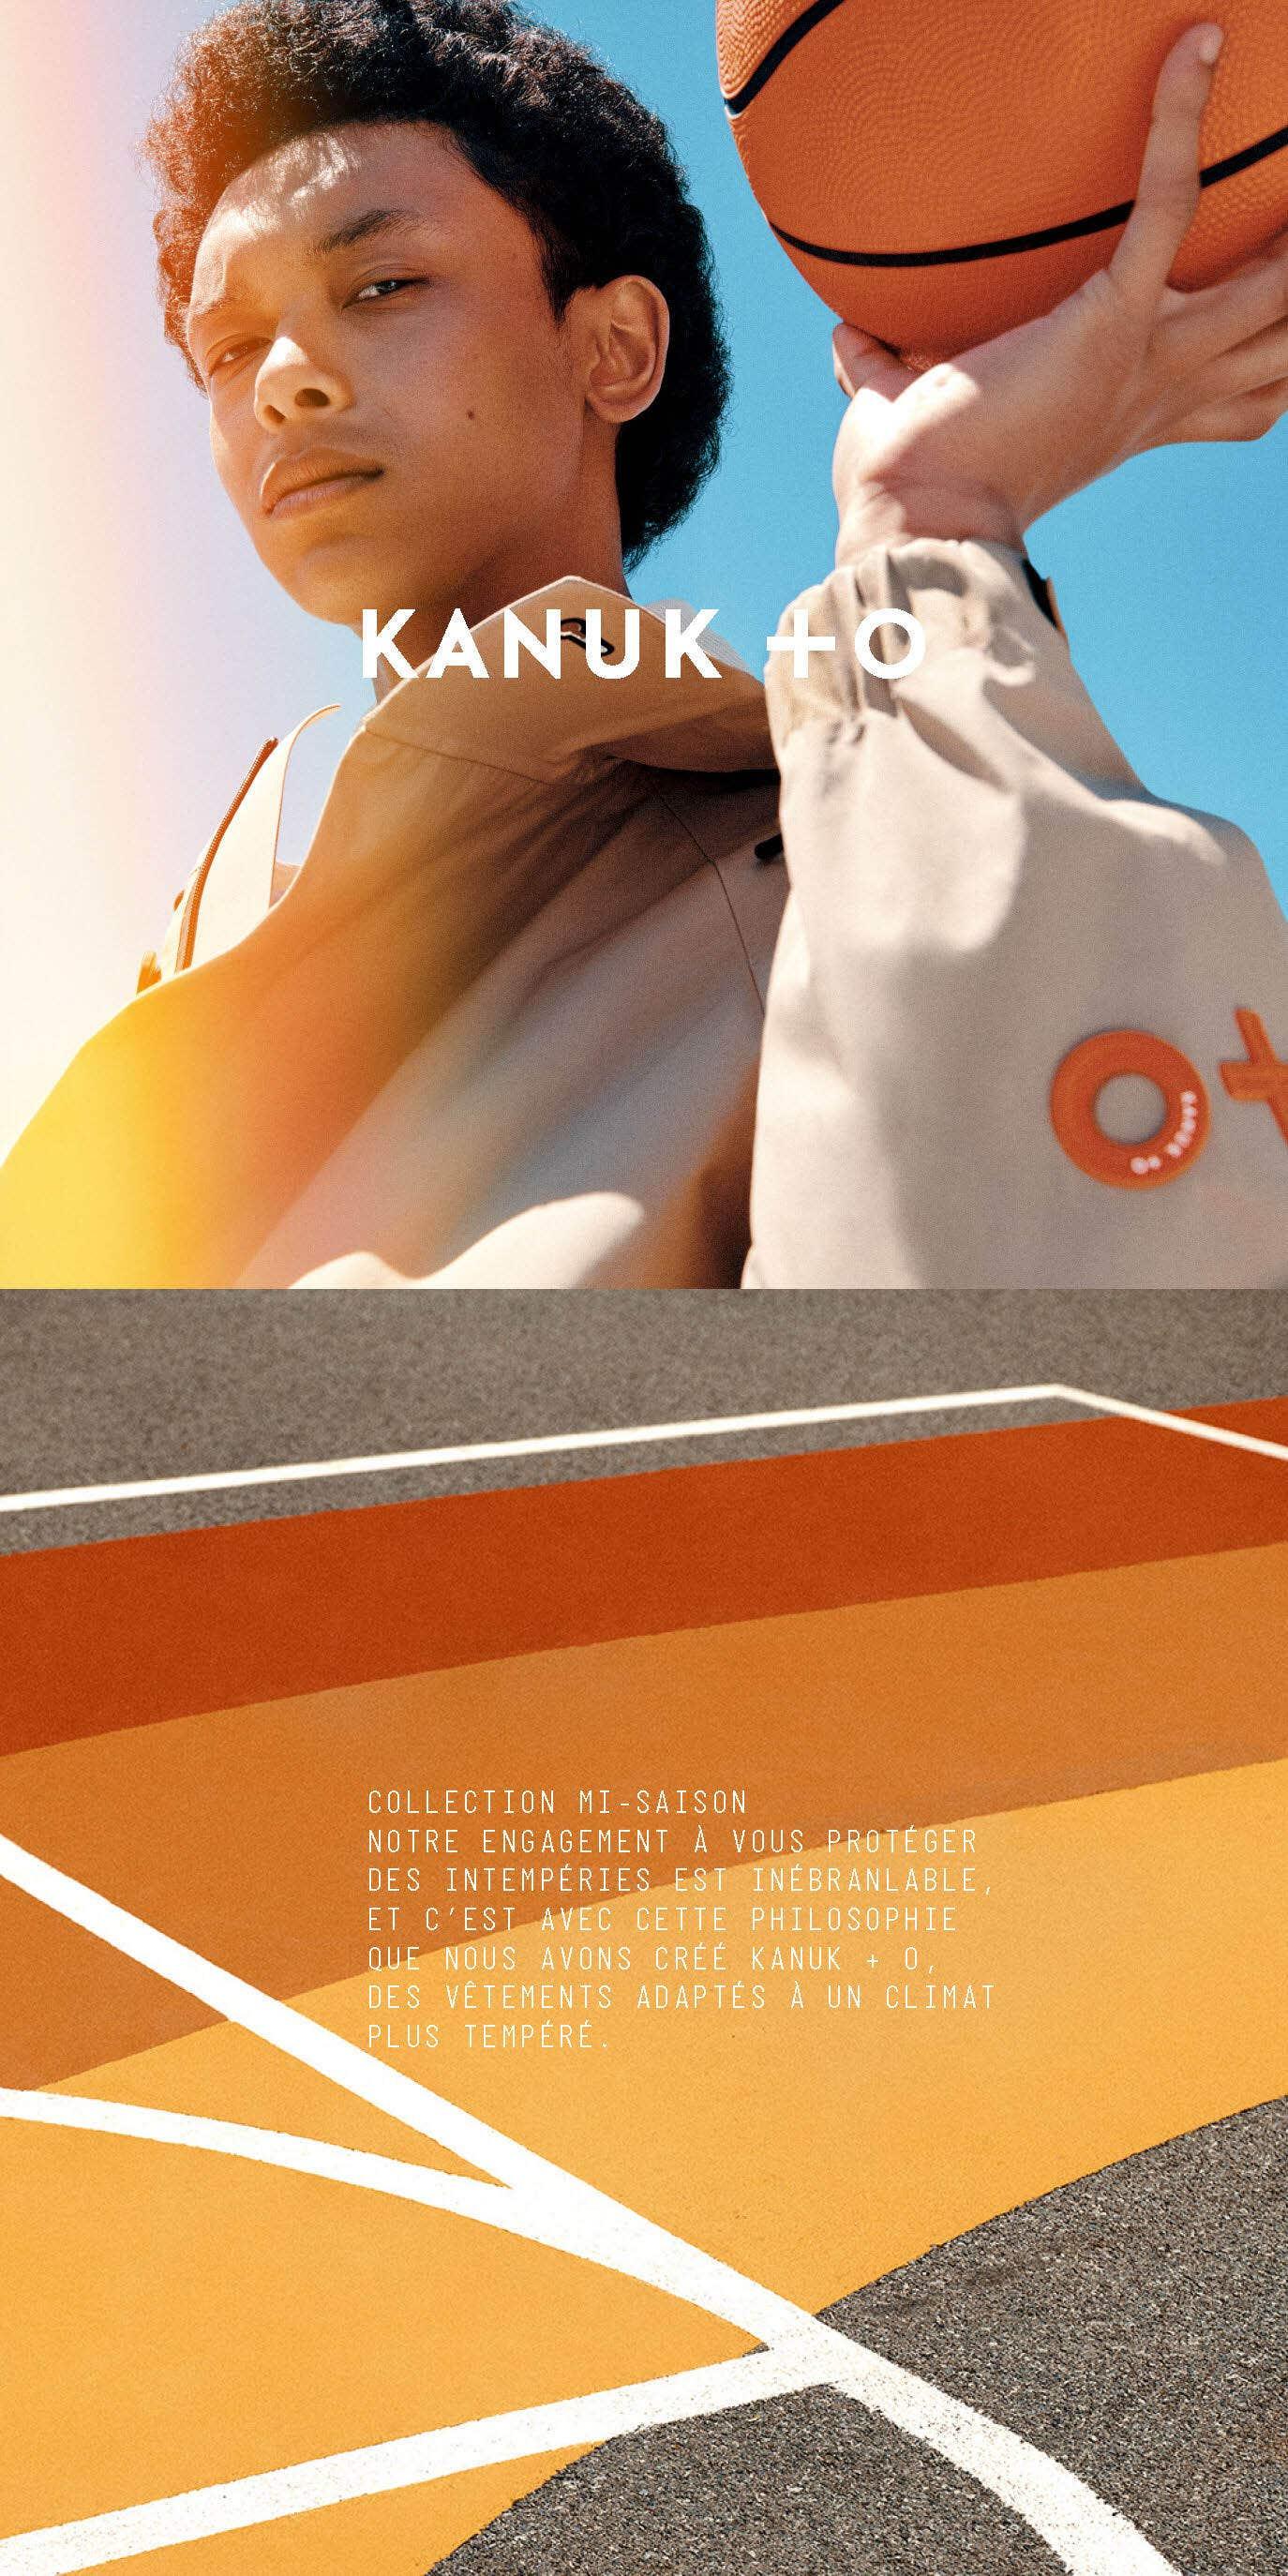 kanuk +O